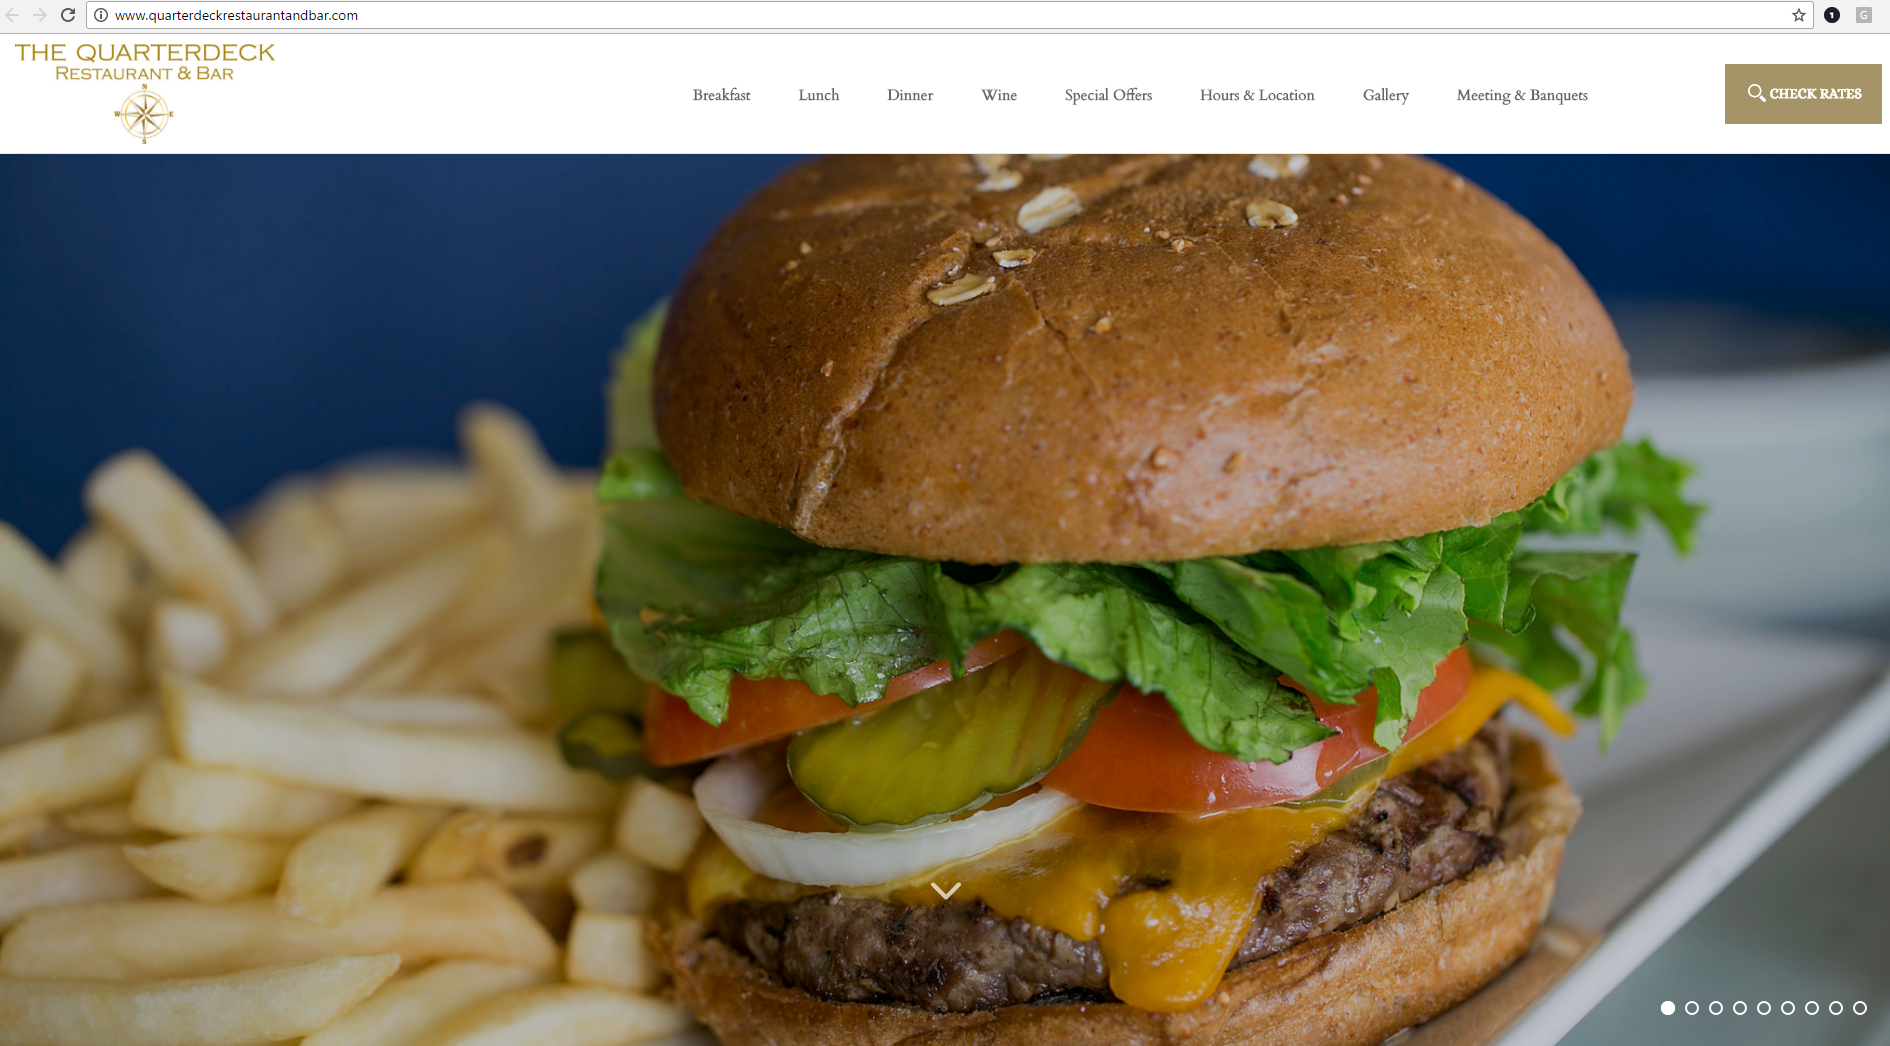 Quarterdeck Restaurant Website